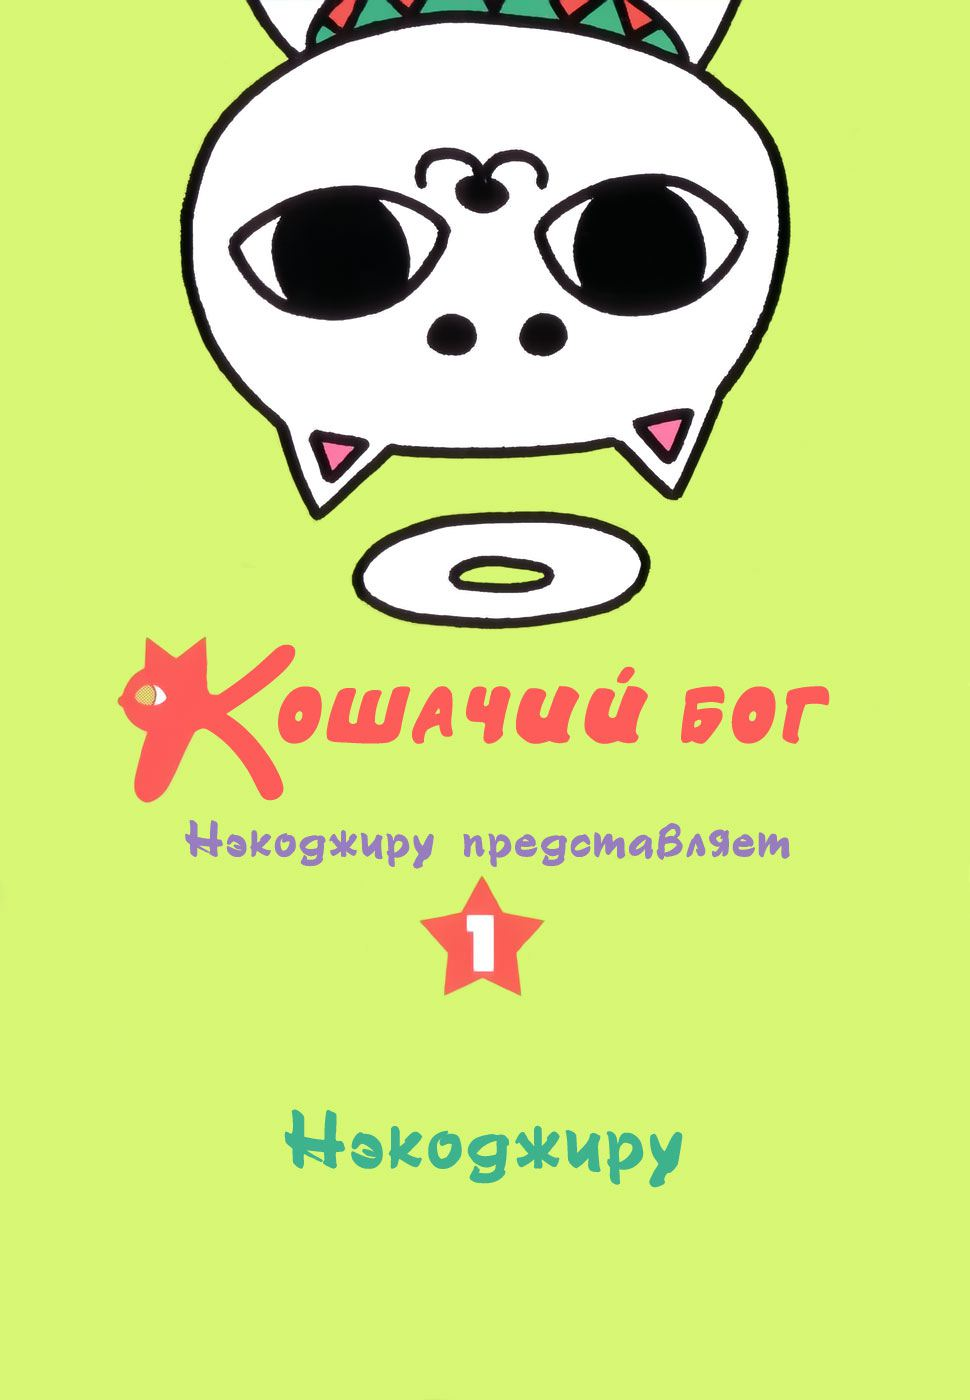 https://r2.ninemanga.com/comics/pic3/43/34923/1290669/1545191406551.jpg Page 1